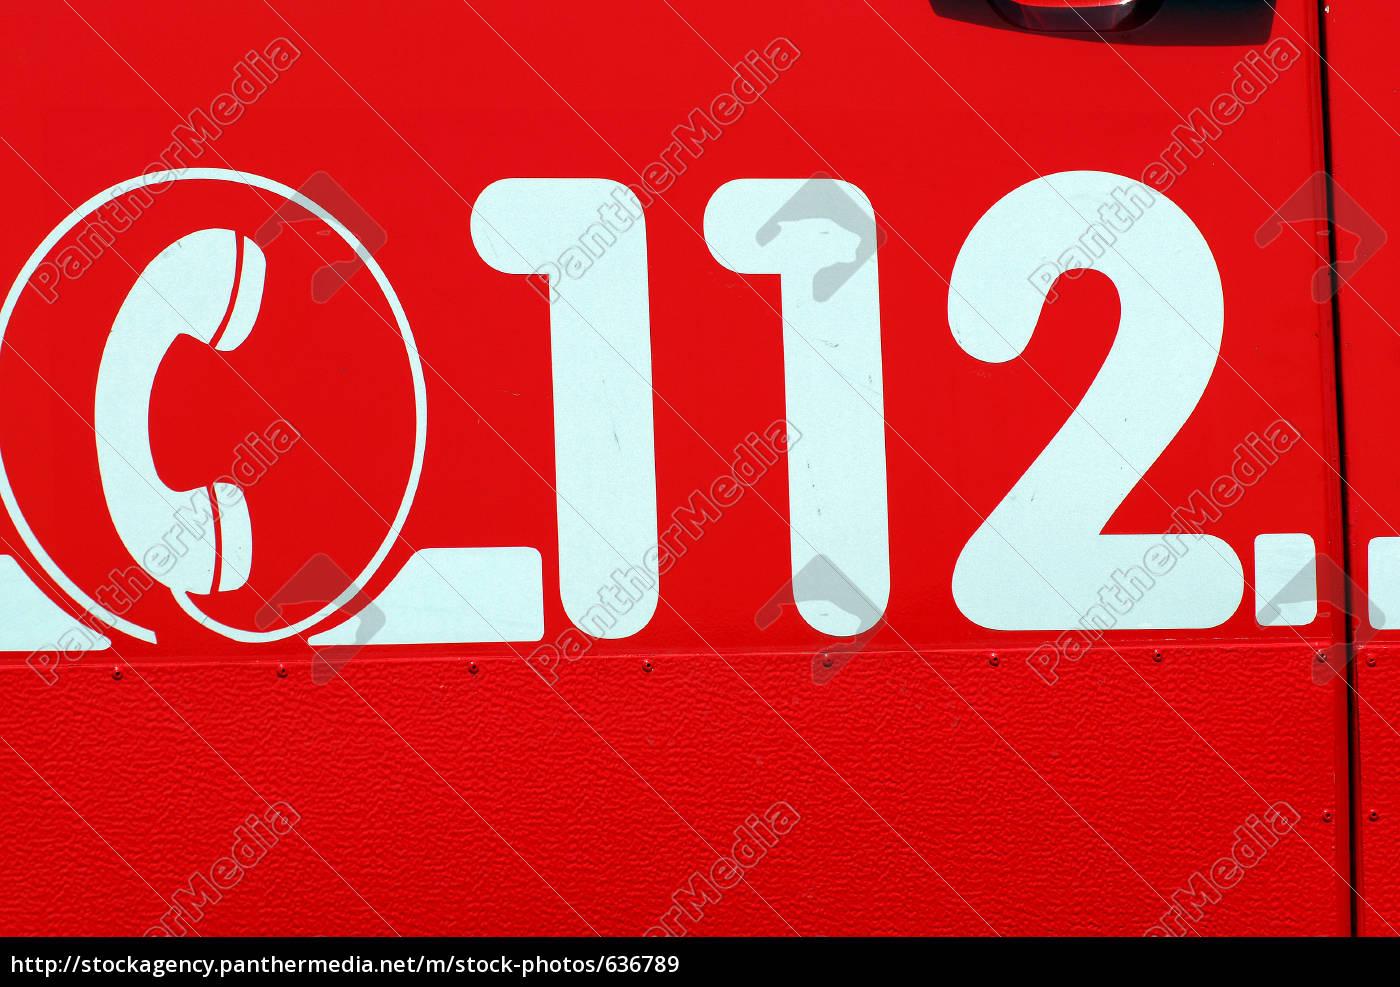 112 - 636789